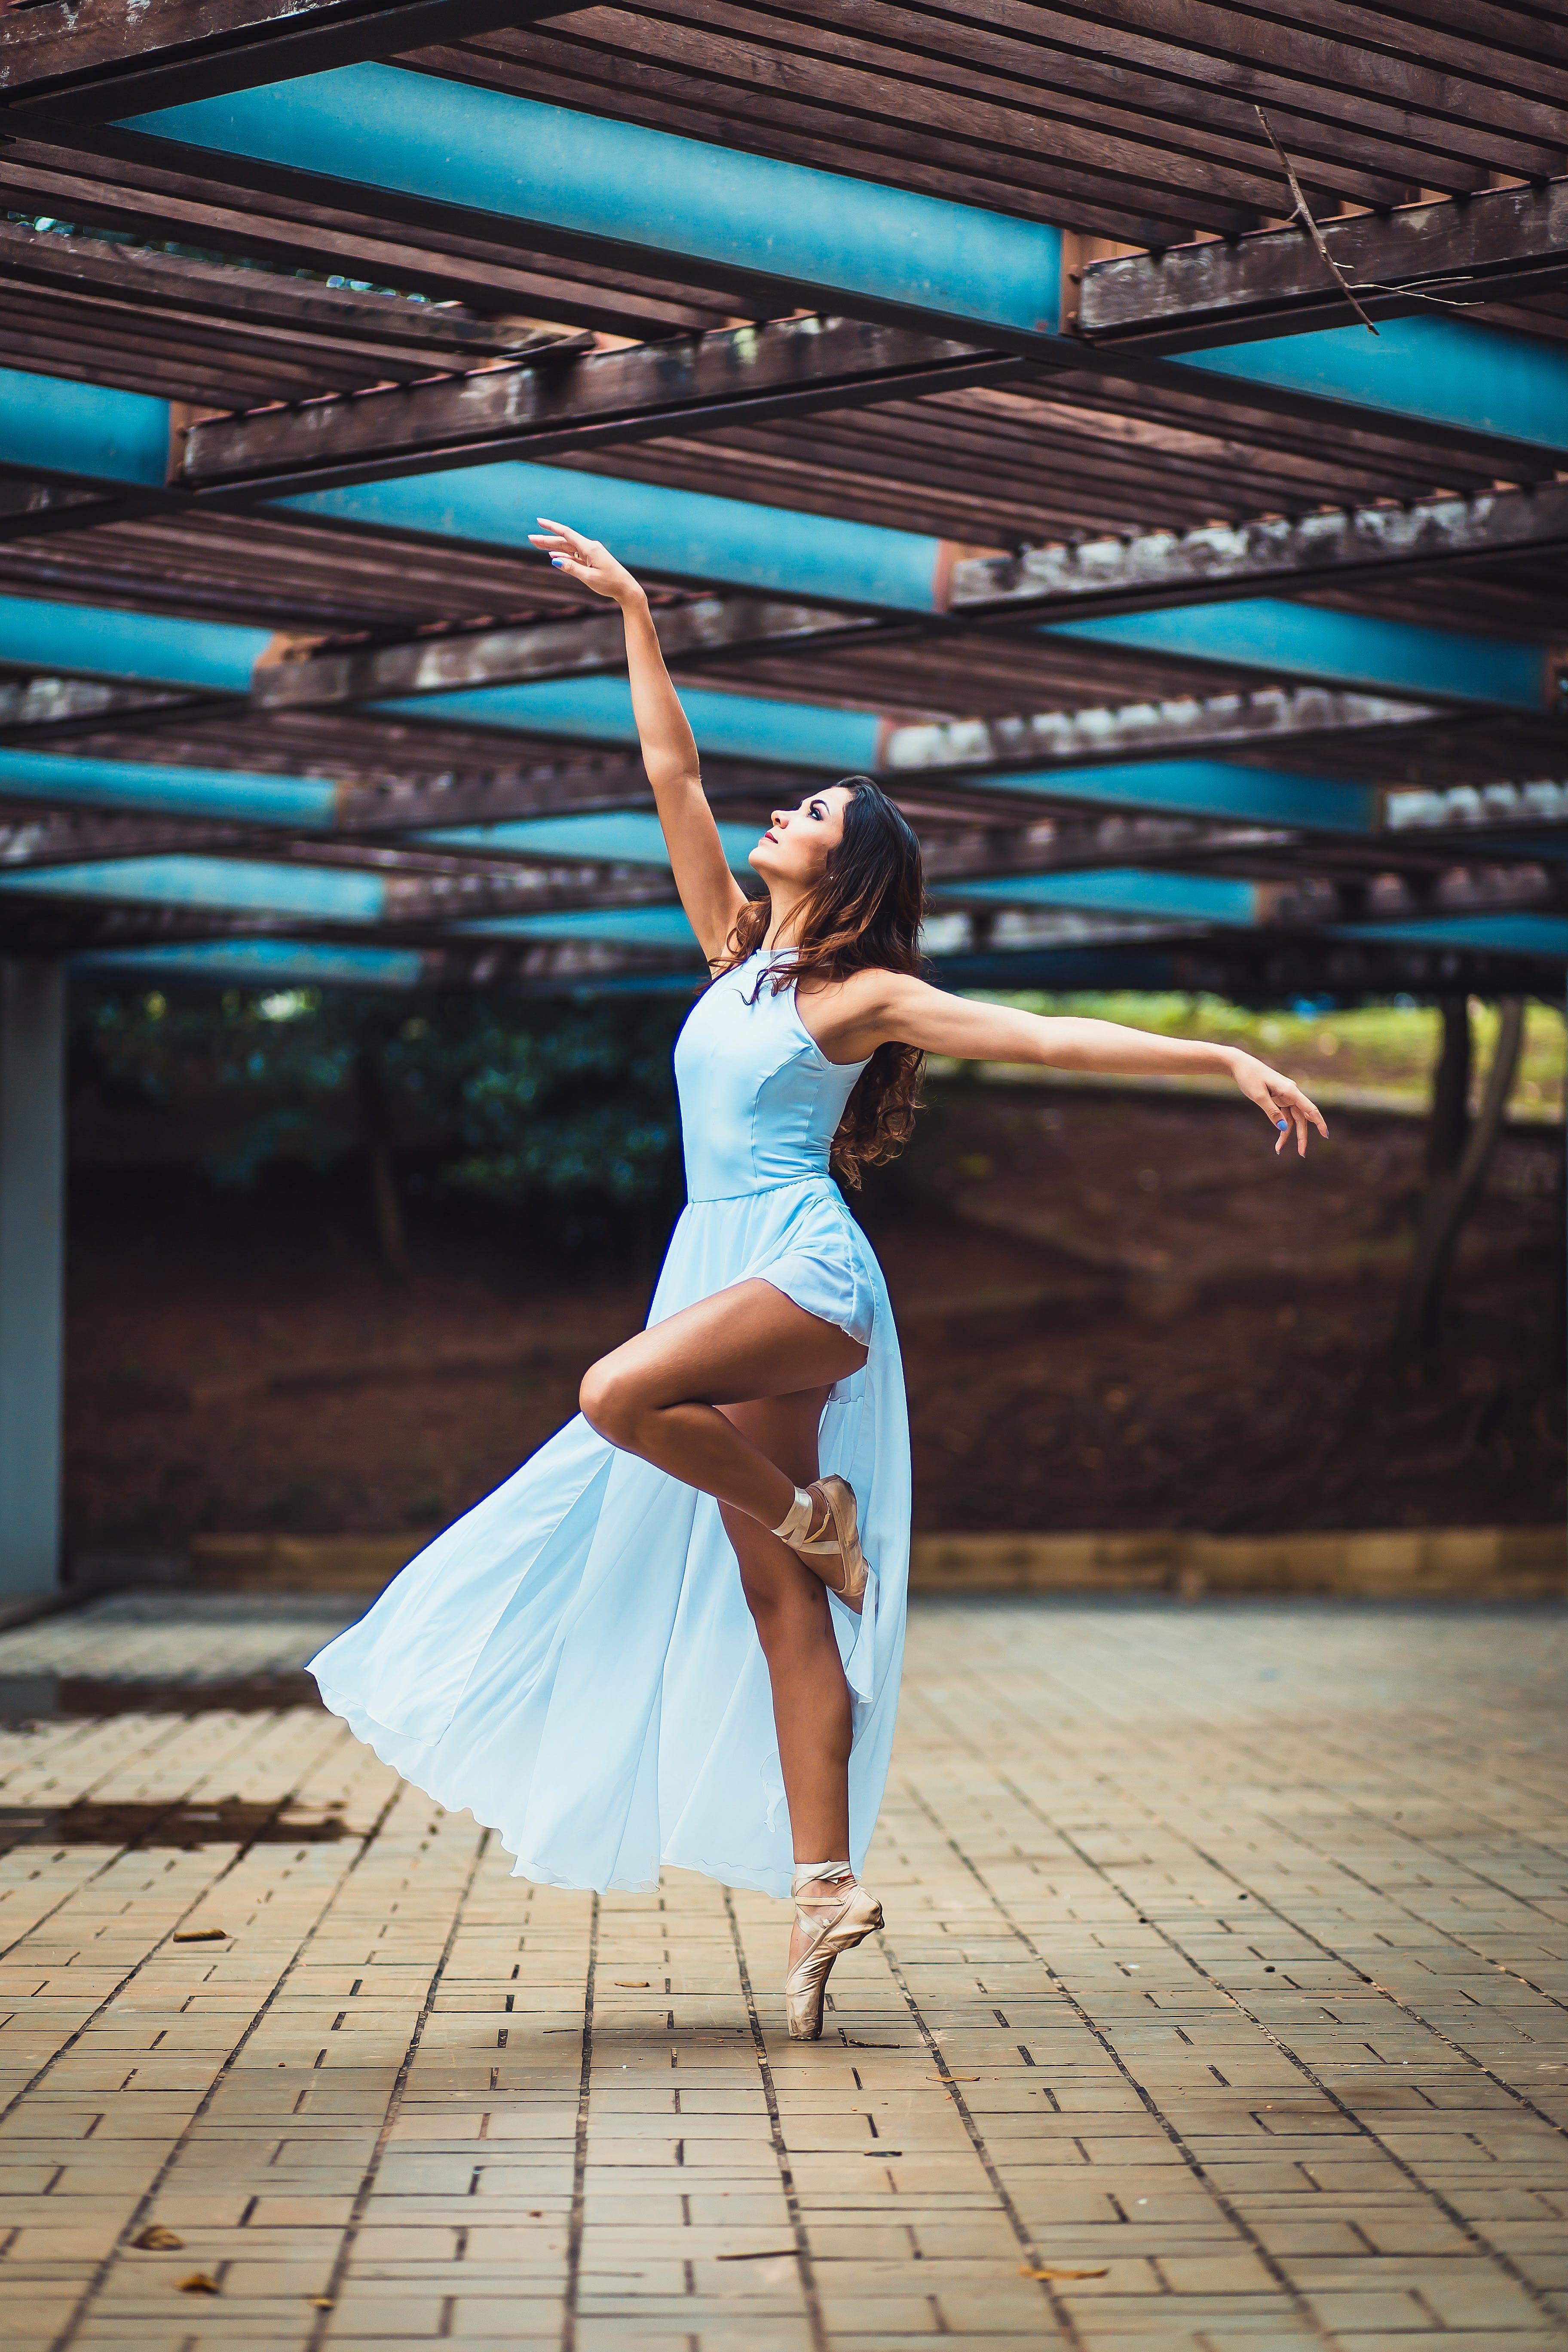 Woman Standing While Wearing Blue Sleeveless Dress